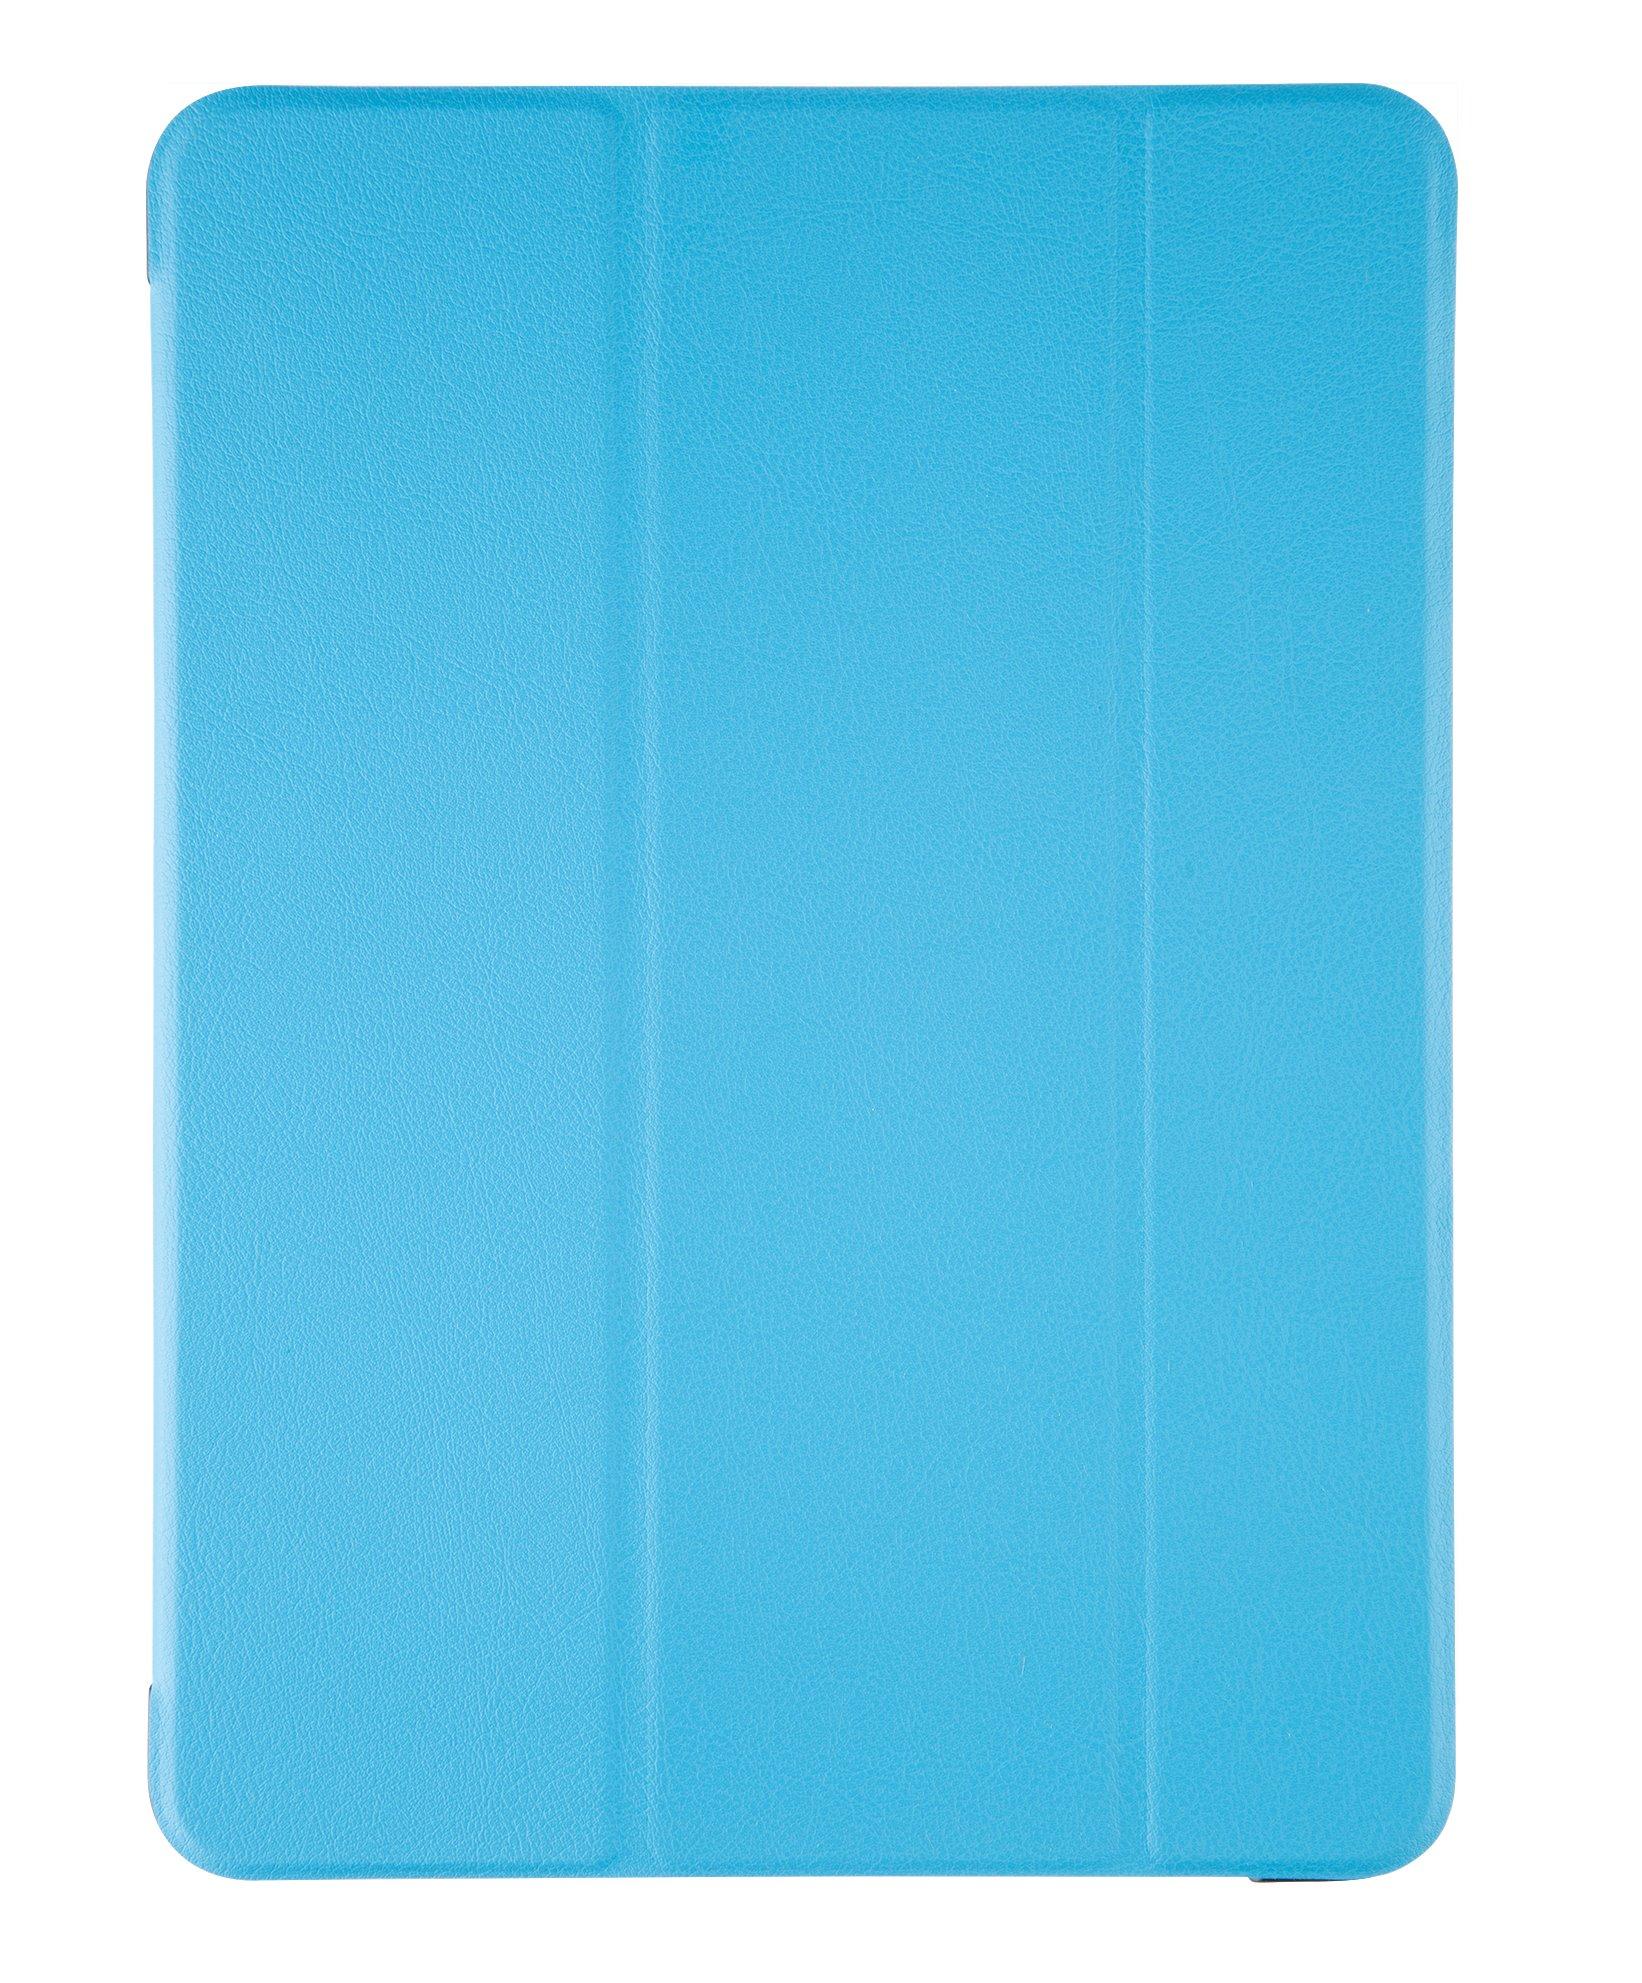 Tactical Book Tri Fold Pouzdro pro Samsung T730/T736/T970/T975 Galaxy Tab S7 FE 5G / S7+ 12.4 Navy 8596311154270